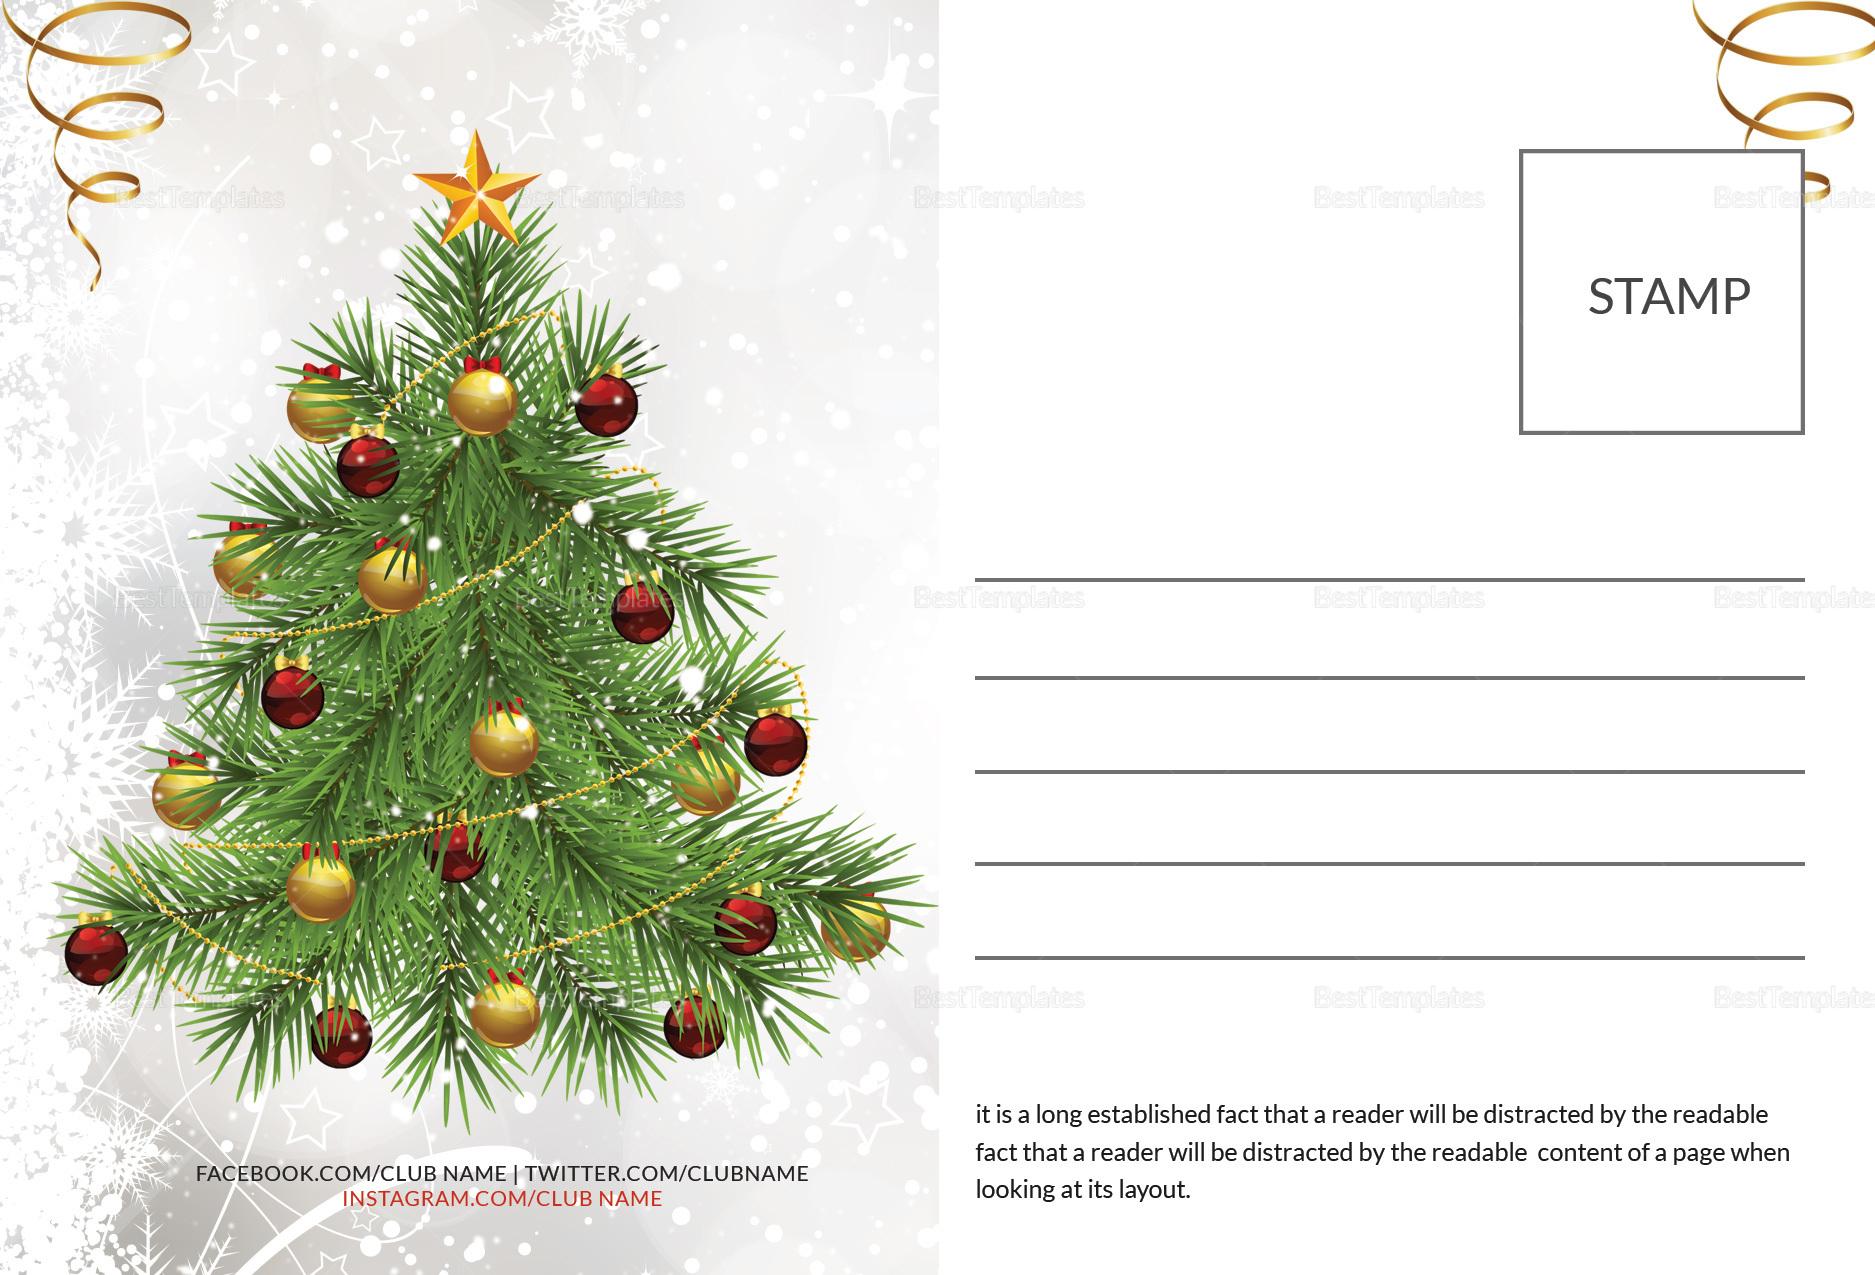 Santa Christmas Postcard Template In Adobe Photoshop